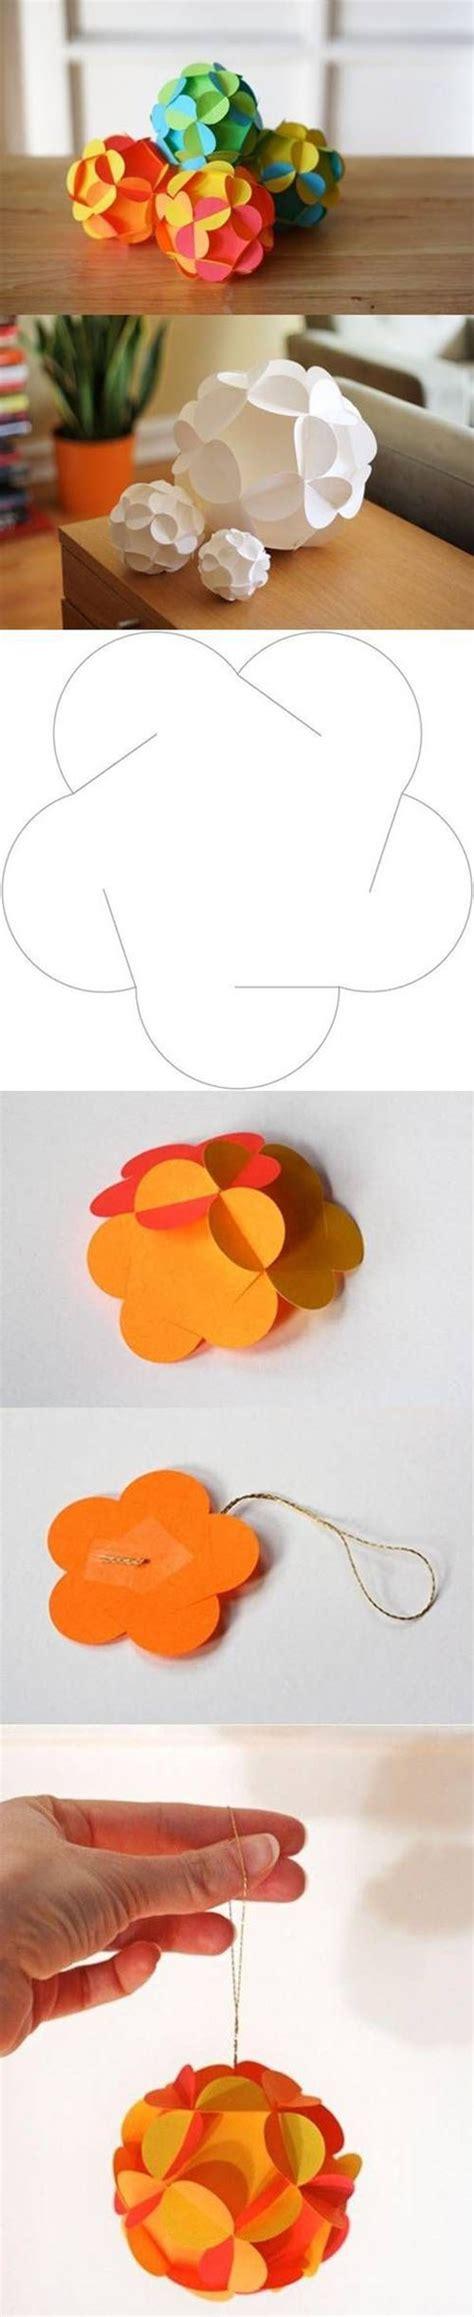 beautiful paper craft beautiful paper craft best diy ideas